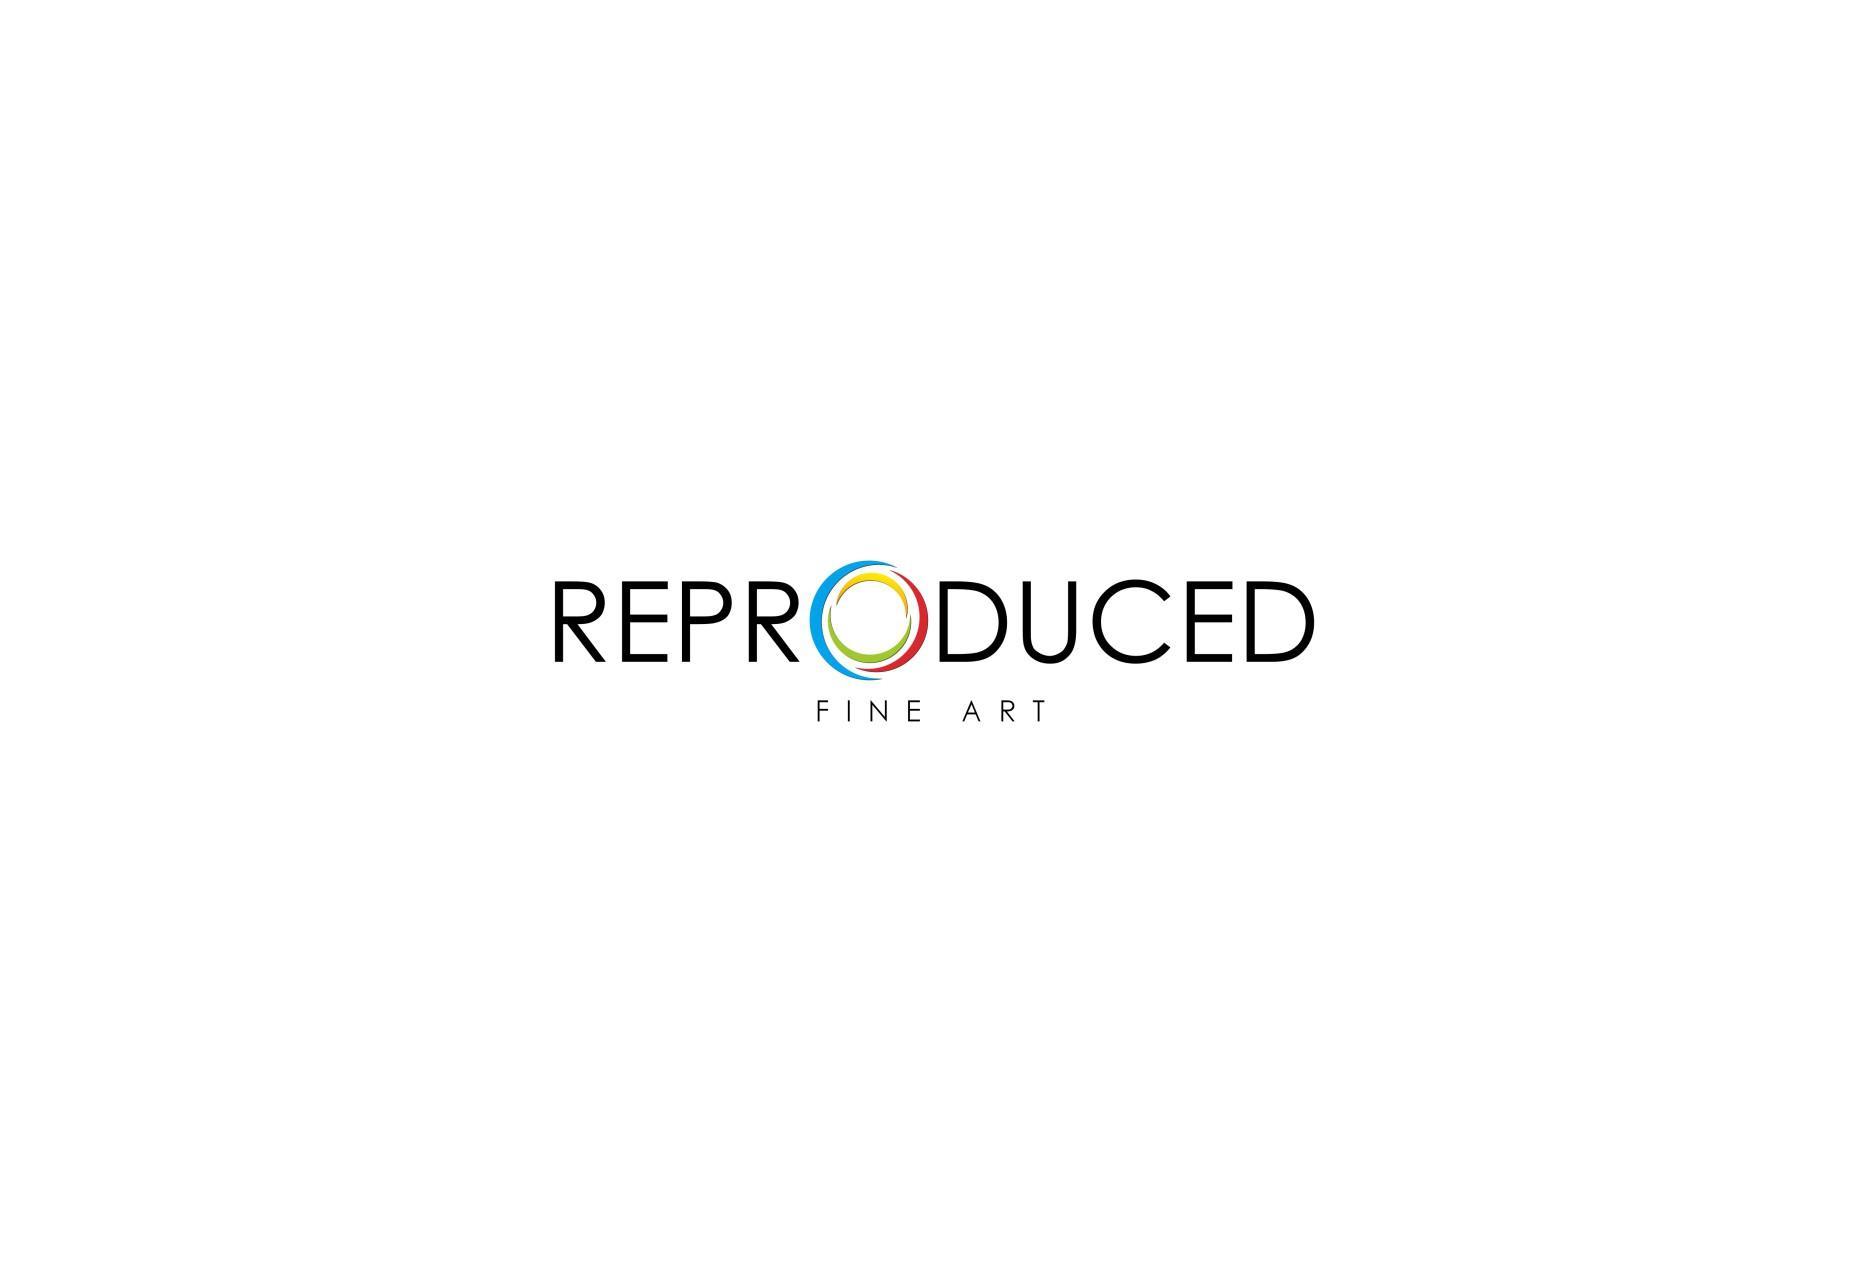 Guaranteed - Logo for Reproduced Fine Art